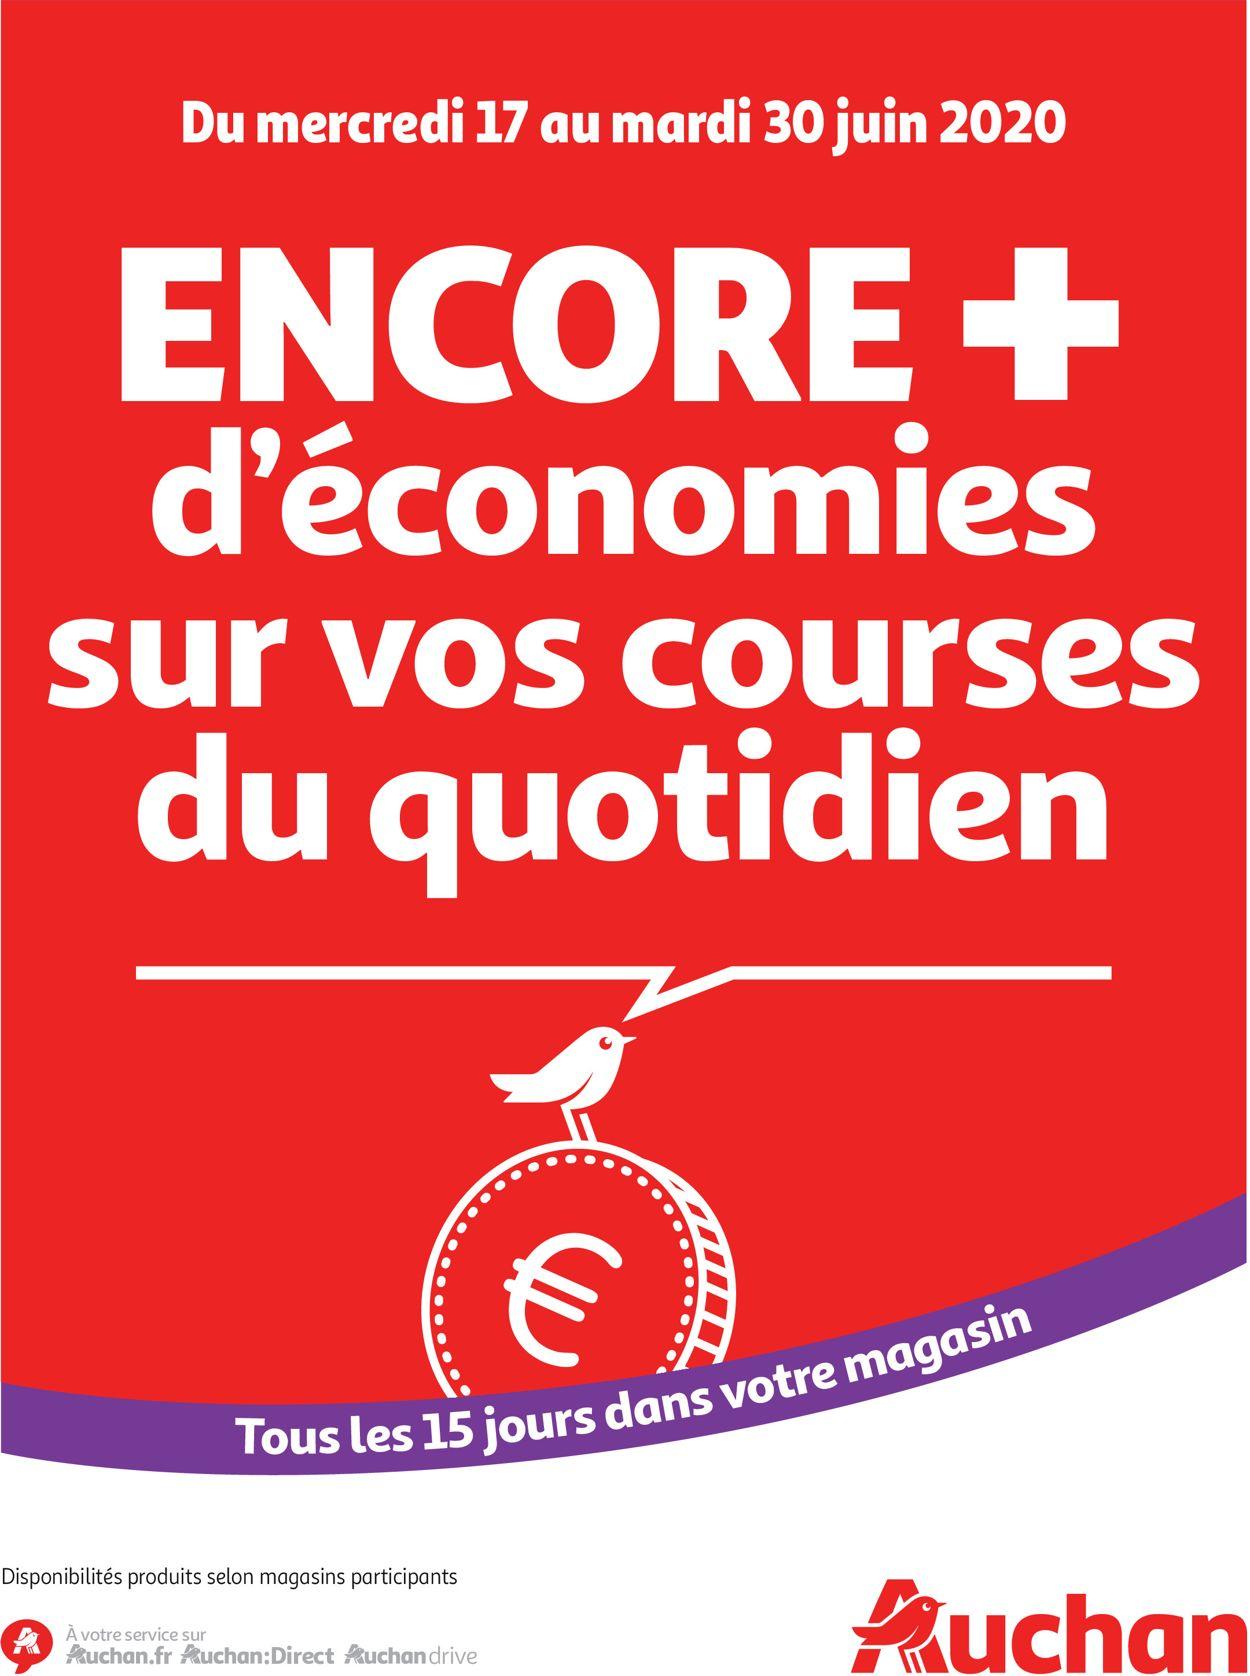 Auchan Catalogue - 17.06-30.06.2020